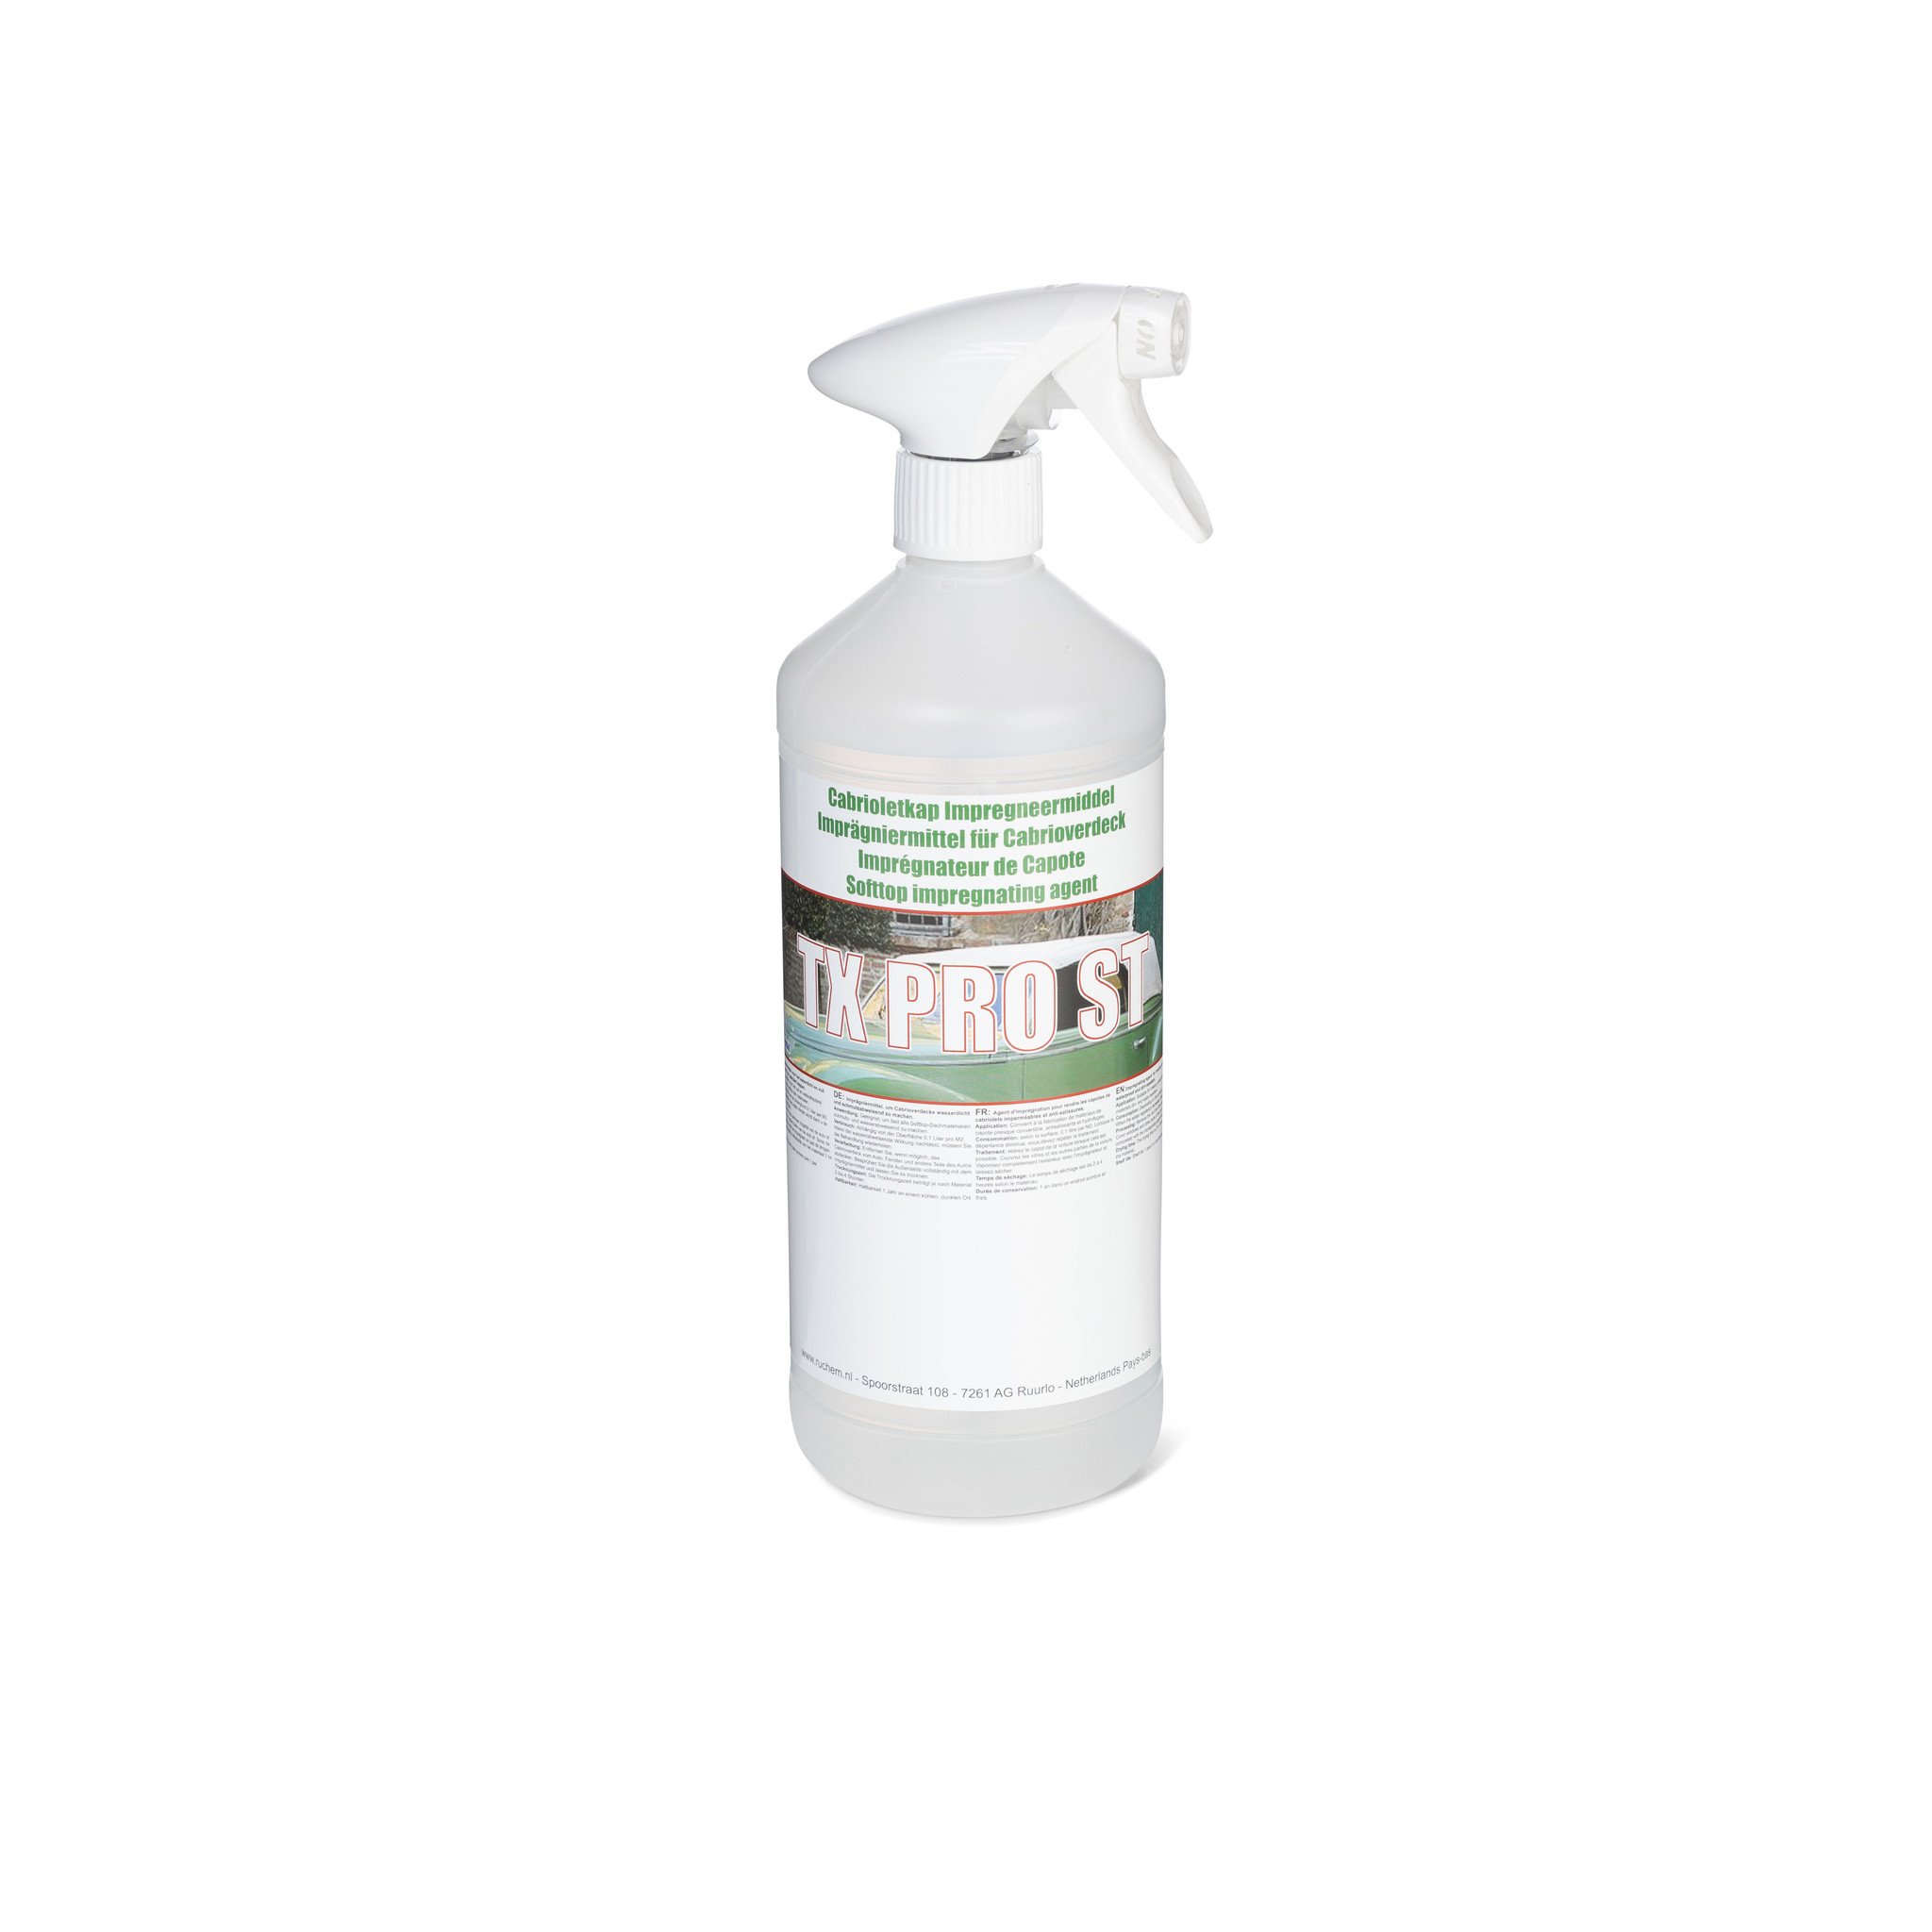 Softtop impregneer spray